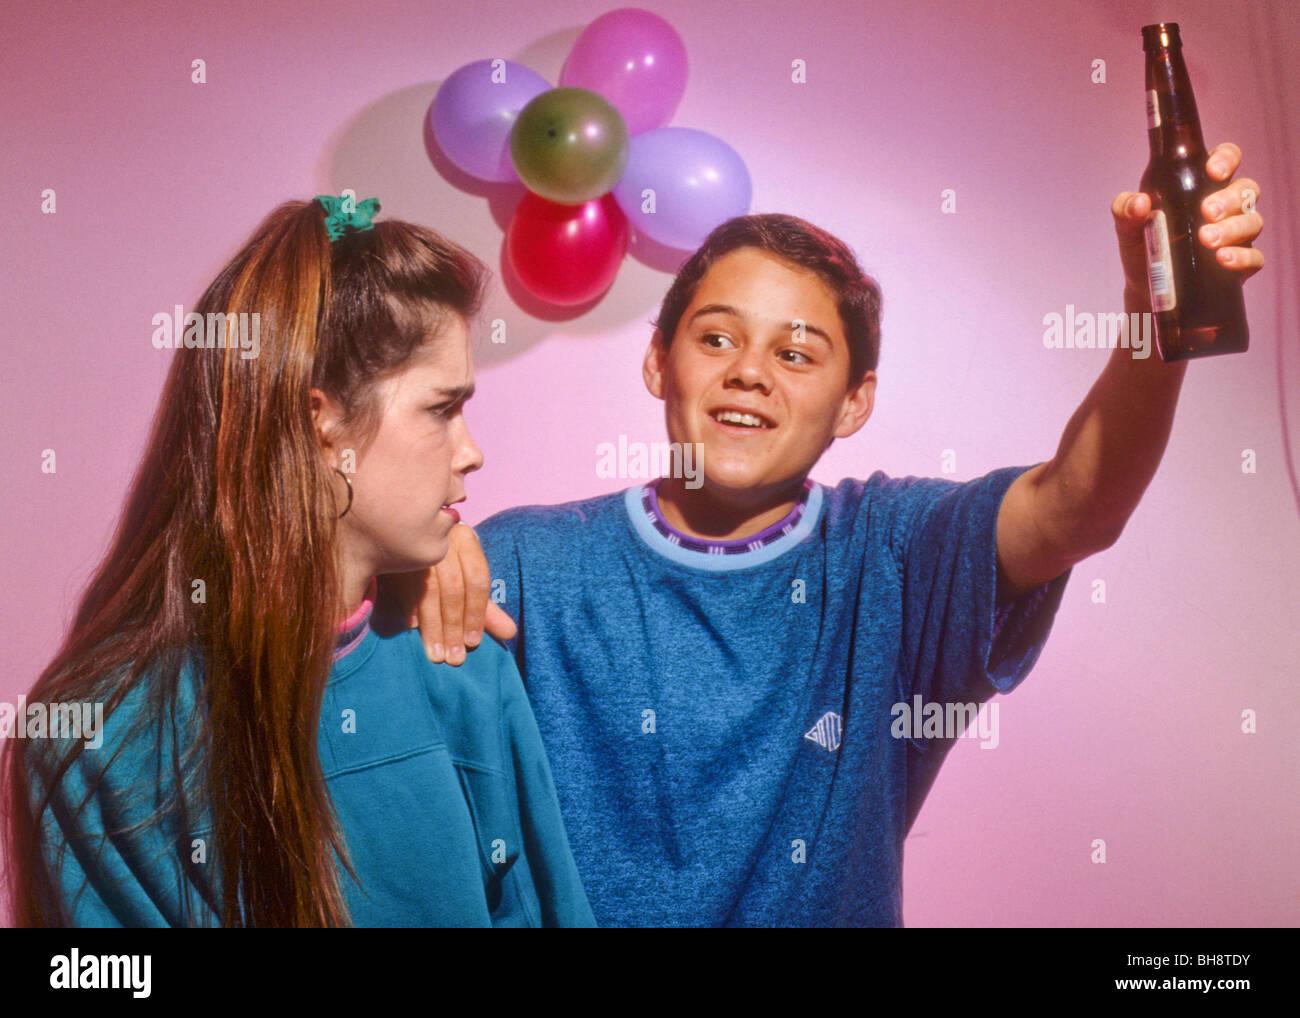 Teen Drink Alcohol Drug Peer Pressure Offer Tempt Boy Girl